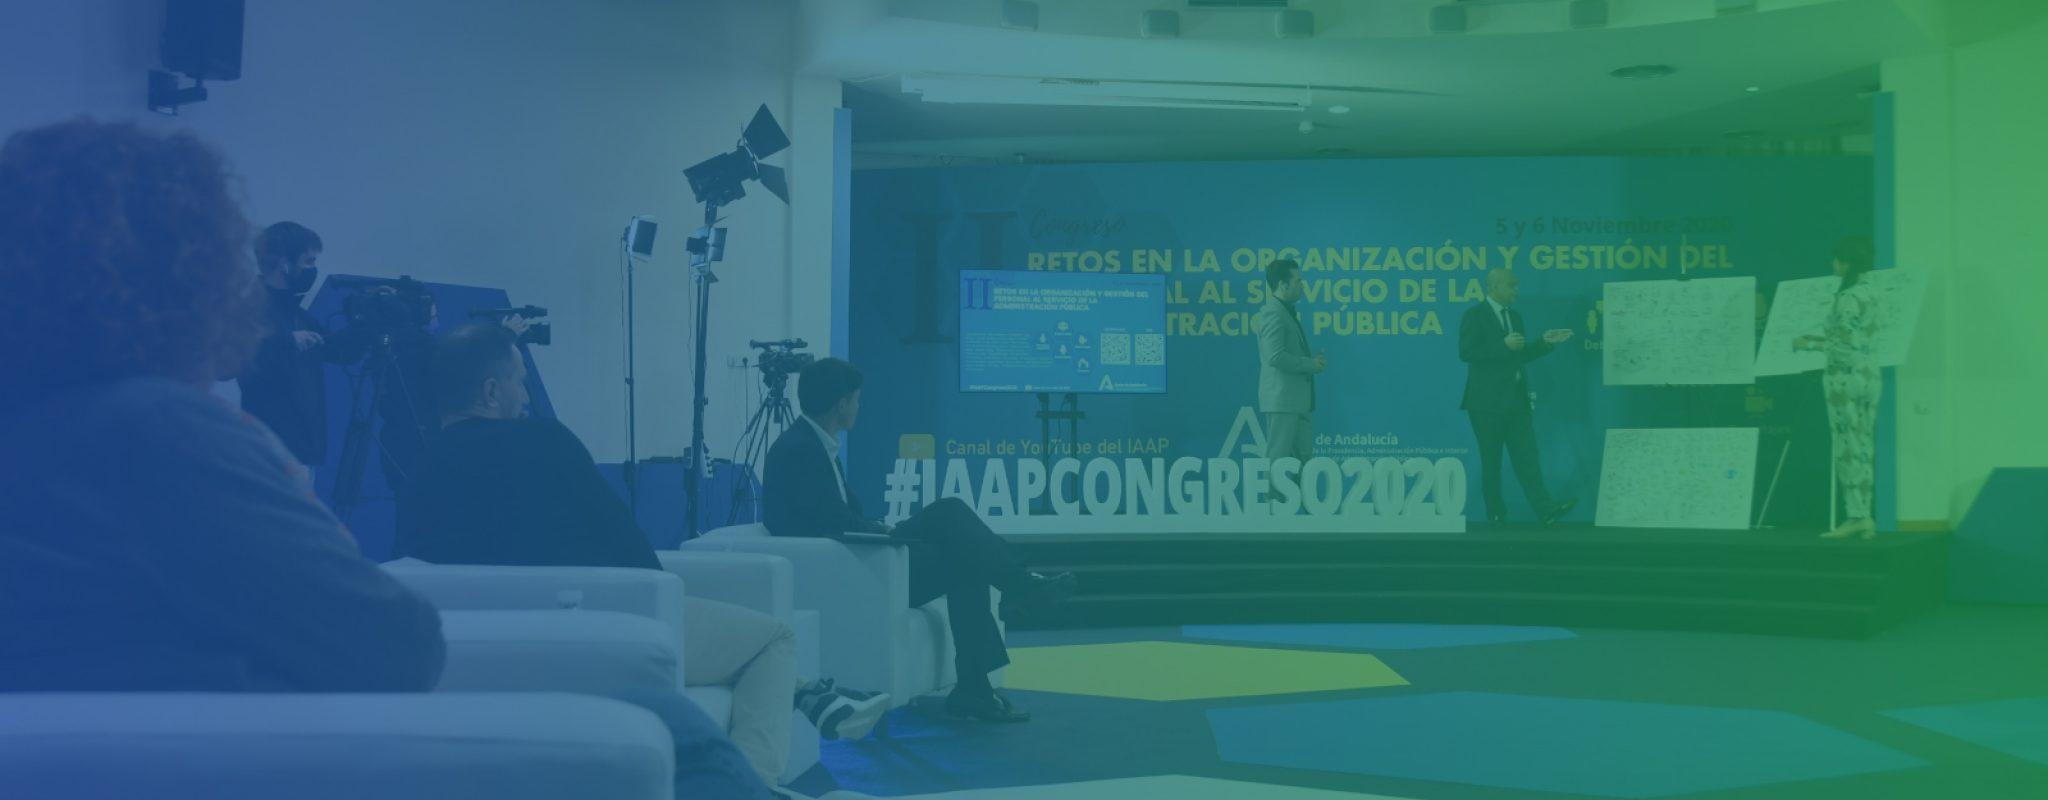 congreso iaap rrhh 2020